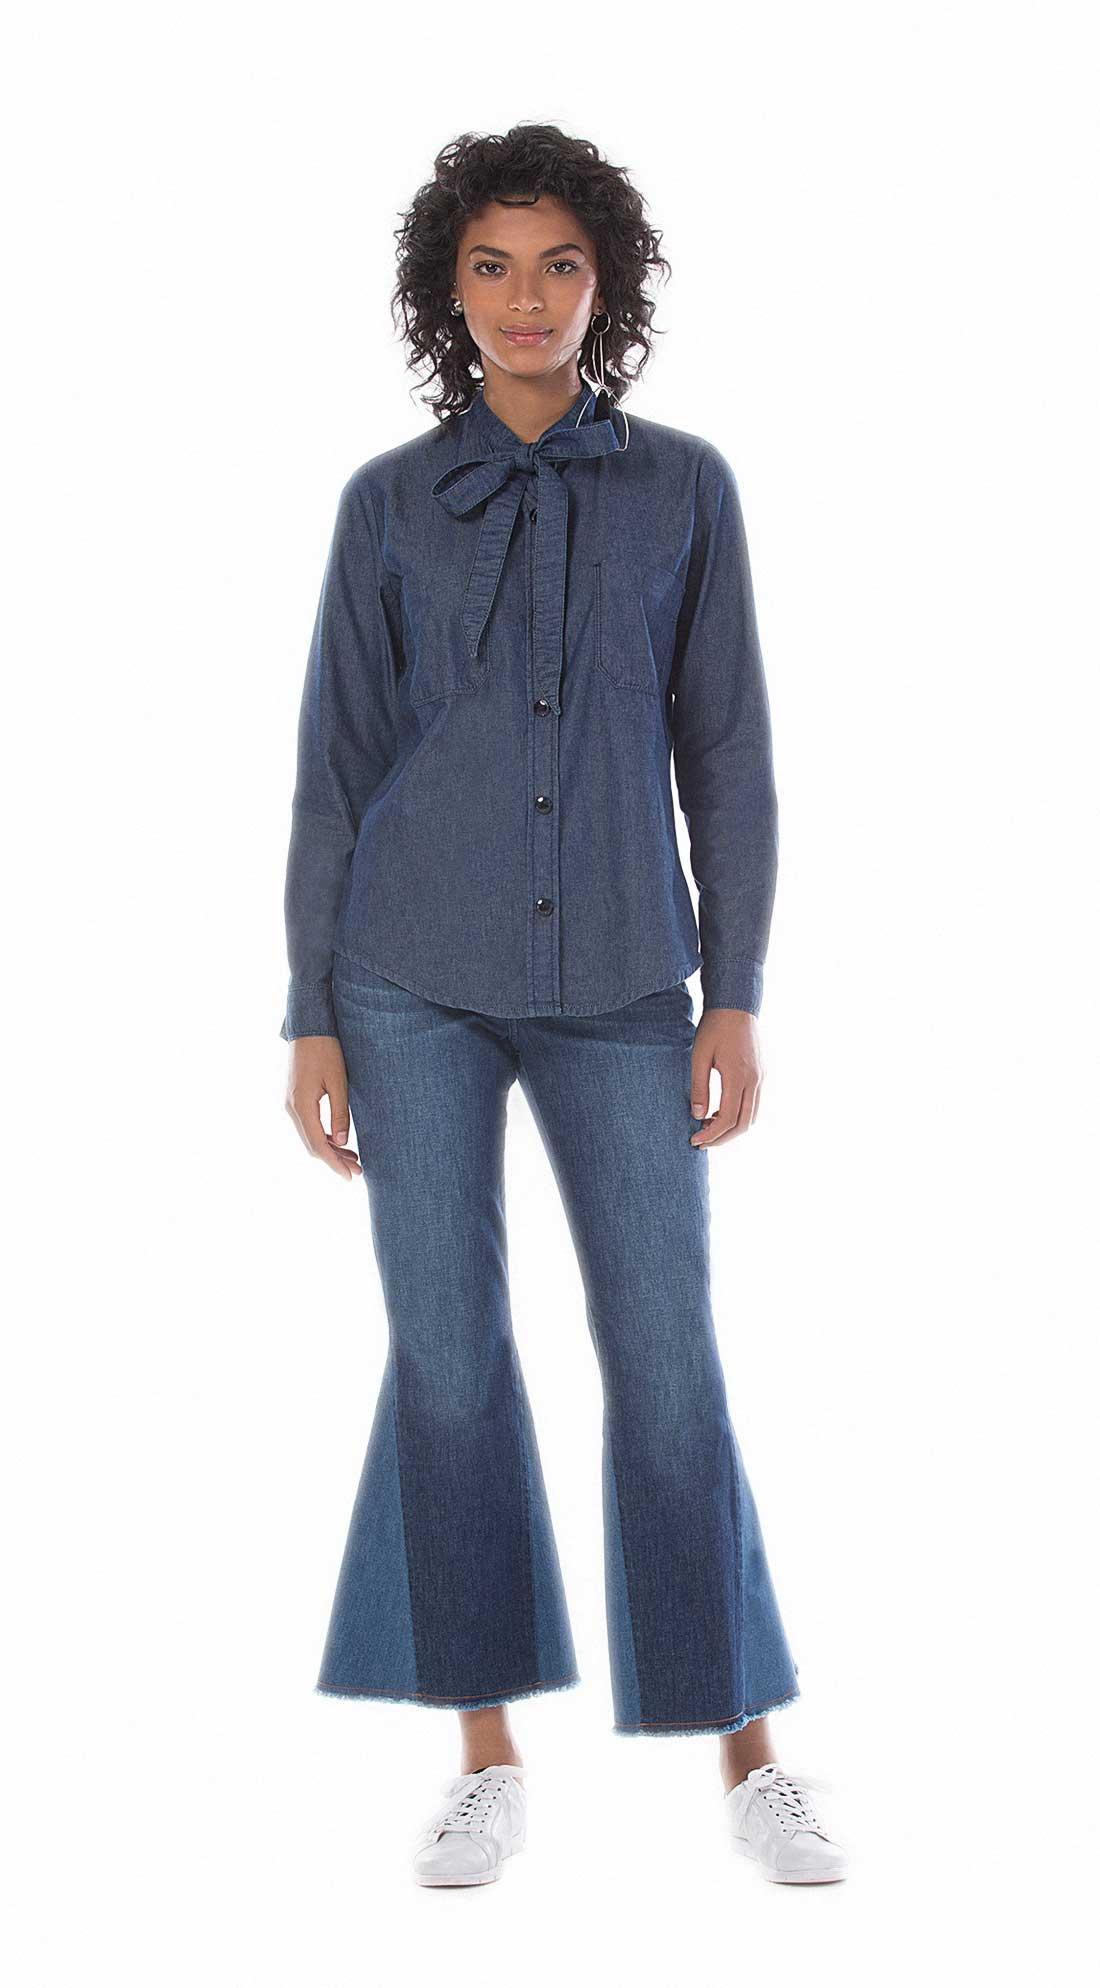 27bc79af44 Camisa Manga Longa Gola Laco Jeans - Maria Valentina